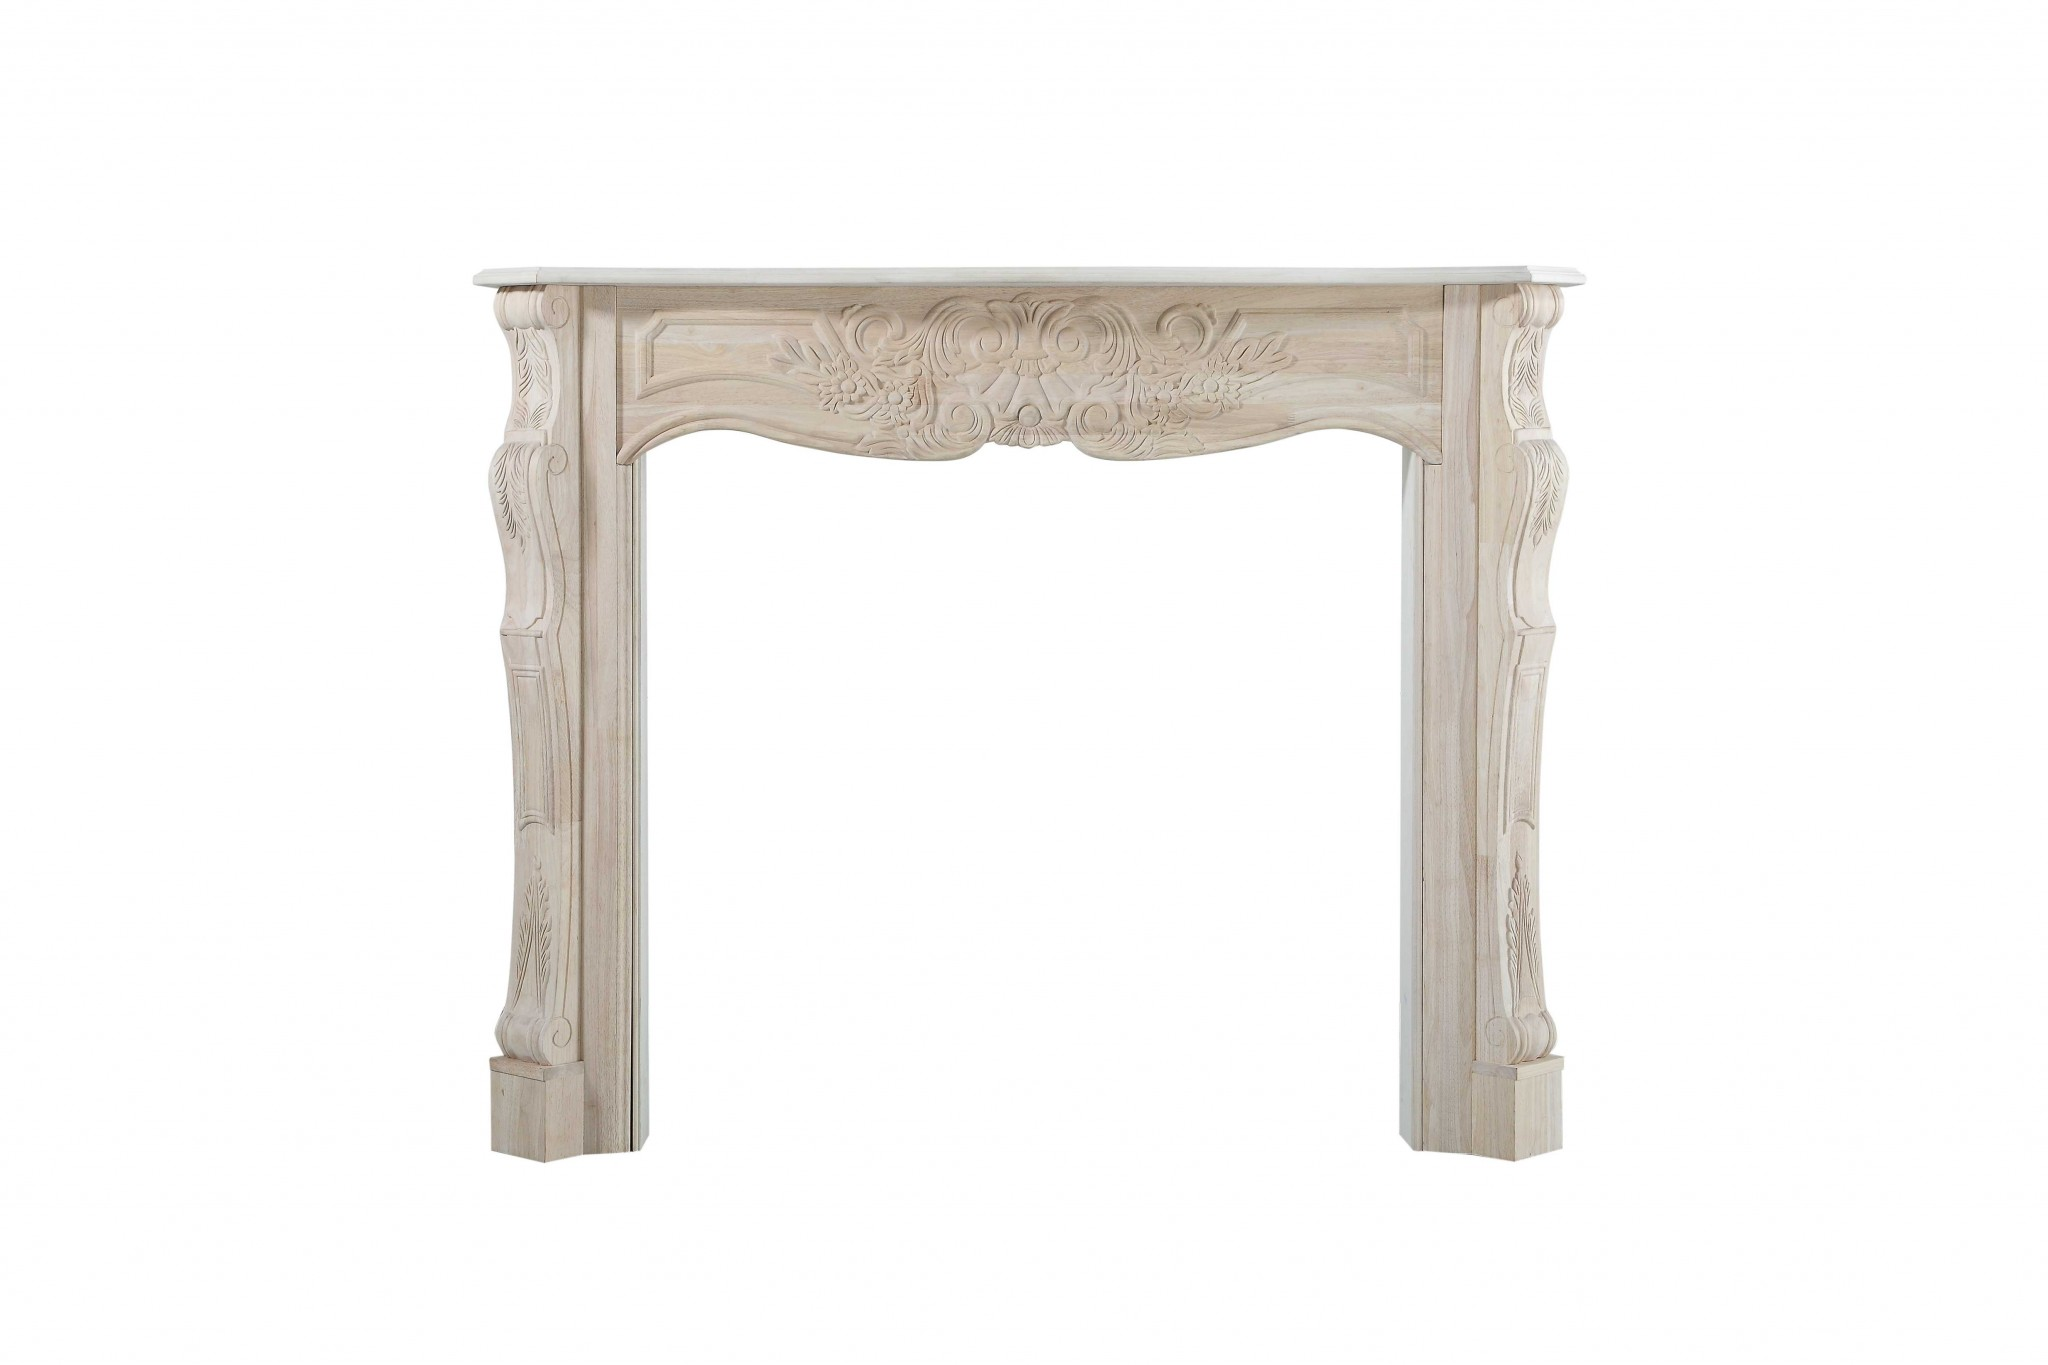 "67"" Modern Unfinished Wood Mantel Shelf"